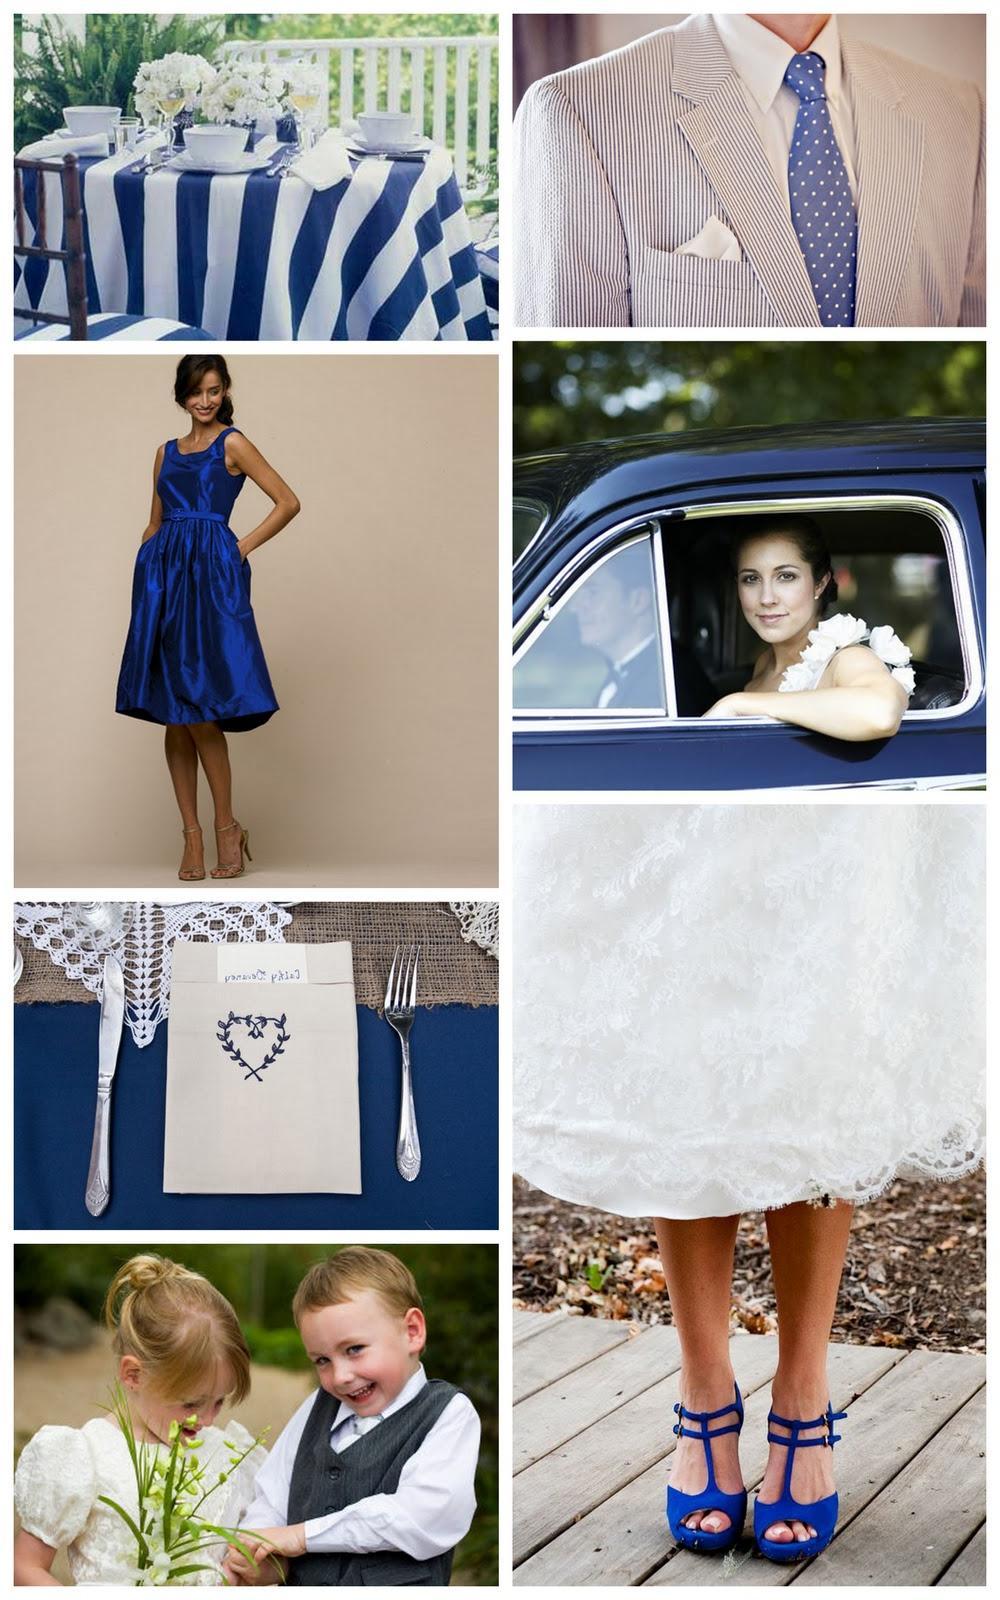 blues wedding table settings